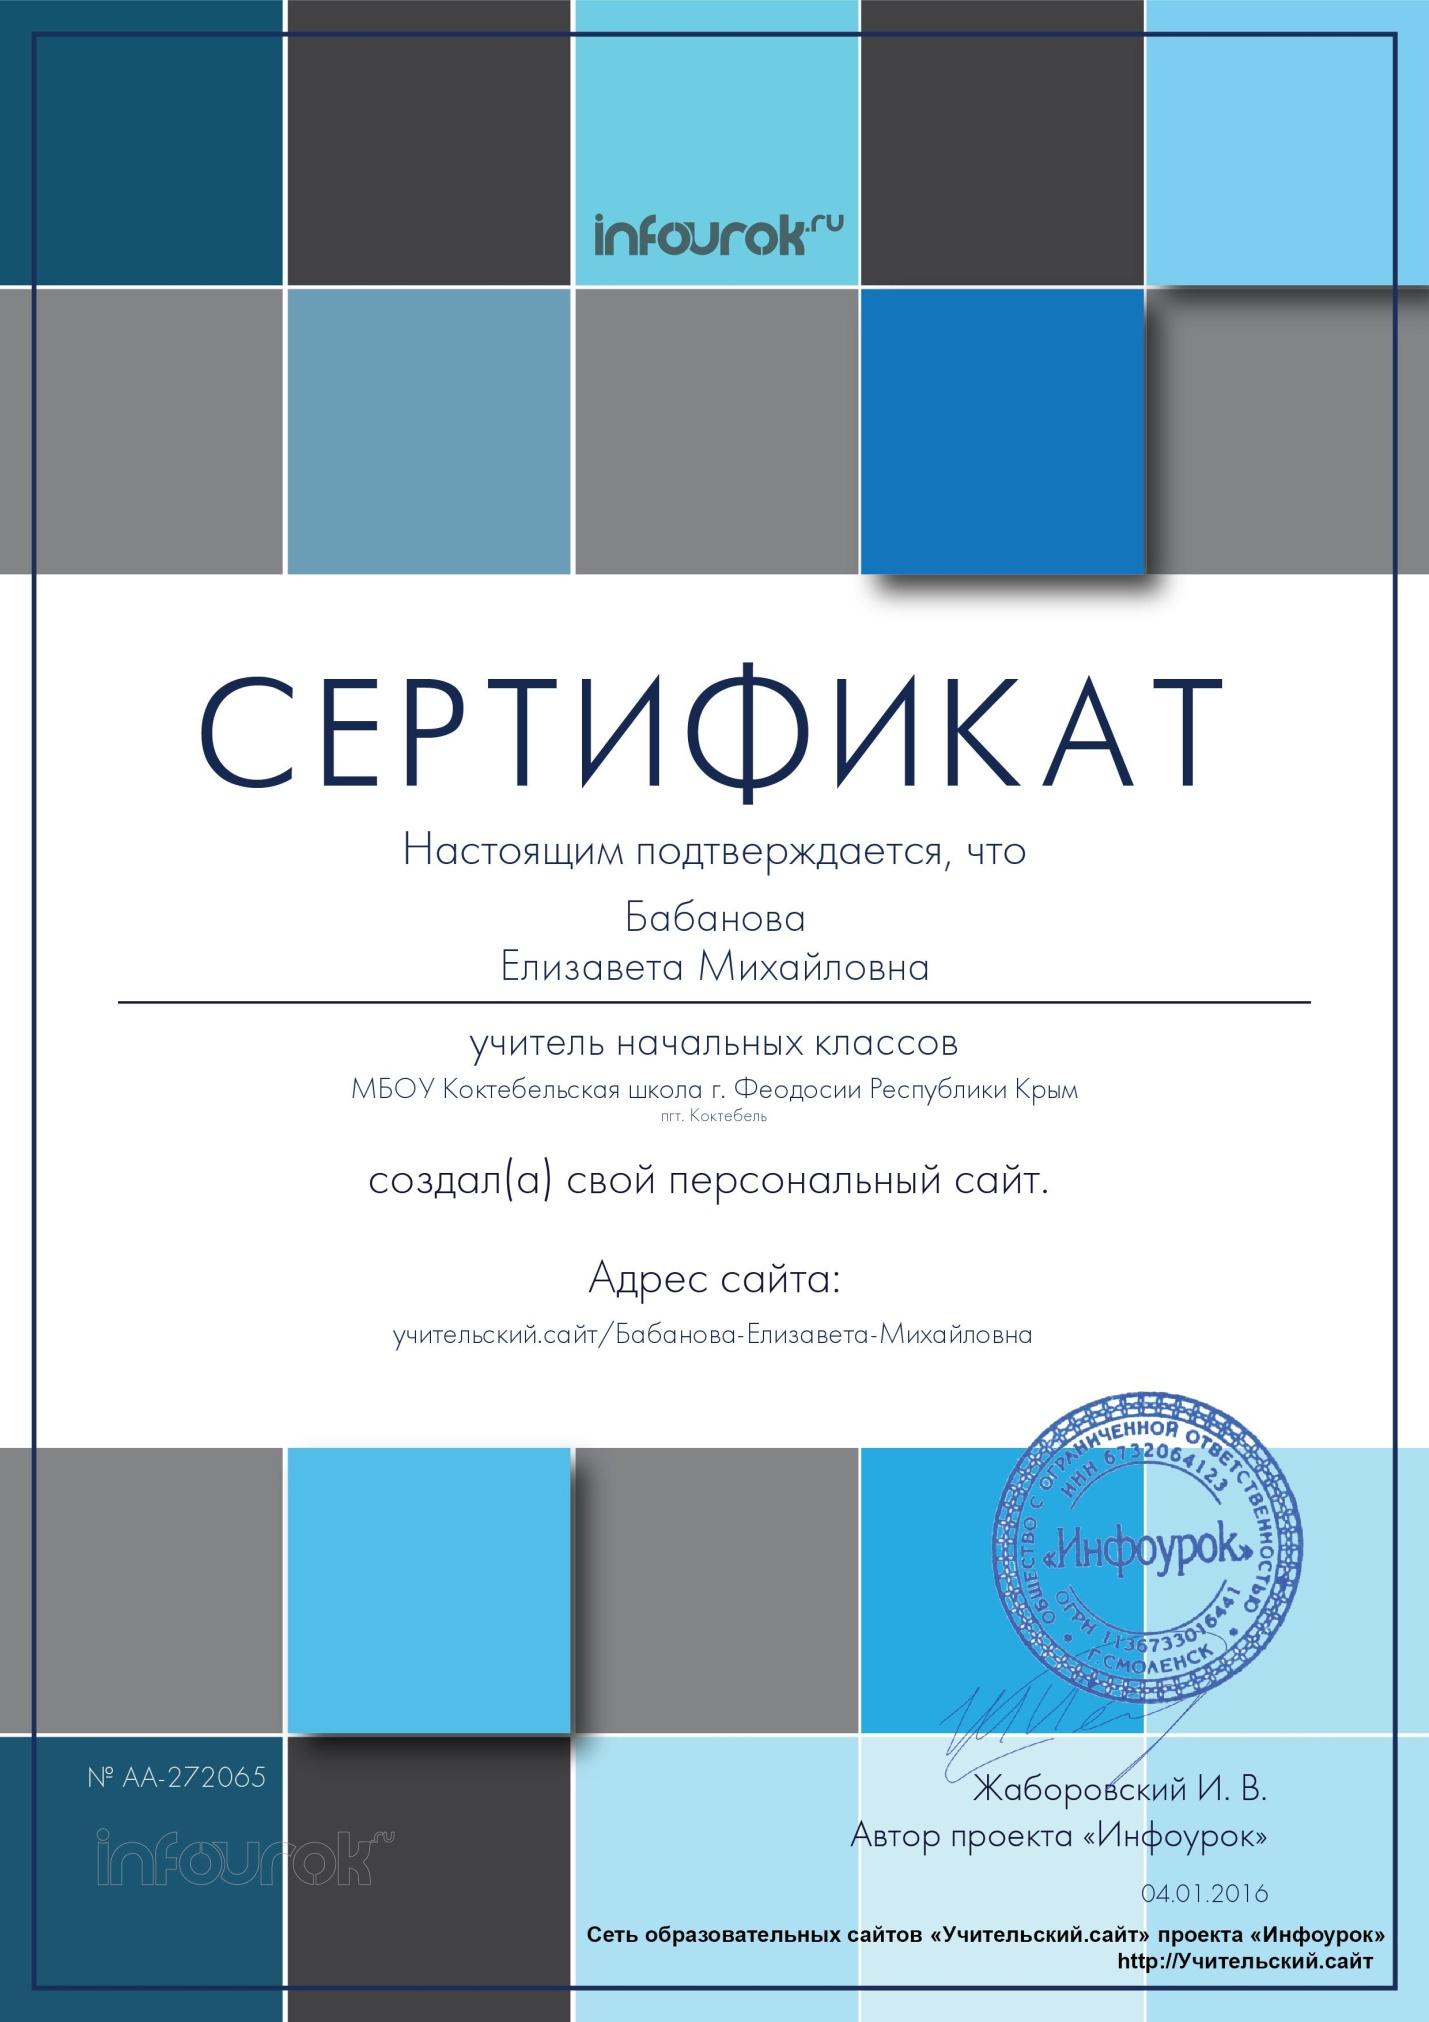 C:\Users\Elizaveta\Desktop\аттестация Бабанова\Лиза сертификаты\Сертификат проекта infourok.ru № АA-272065.jpg